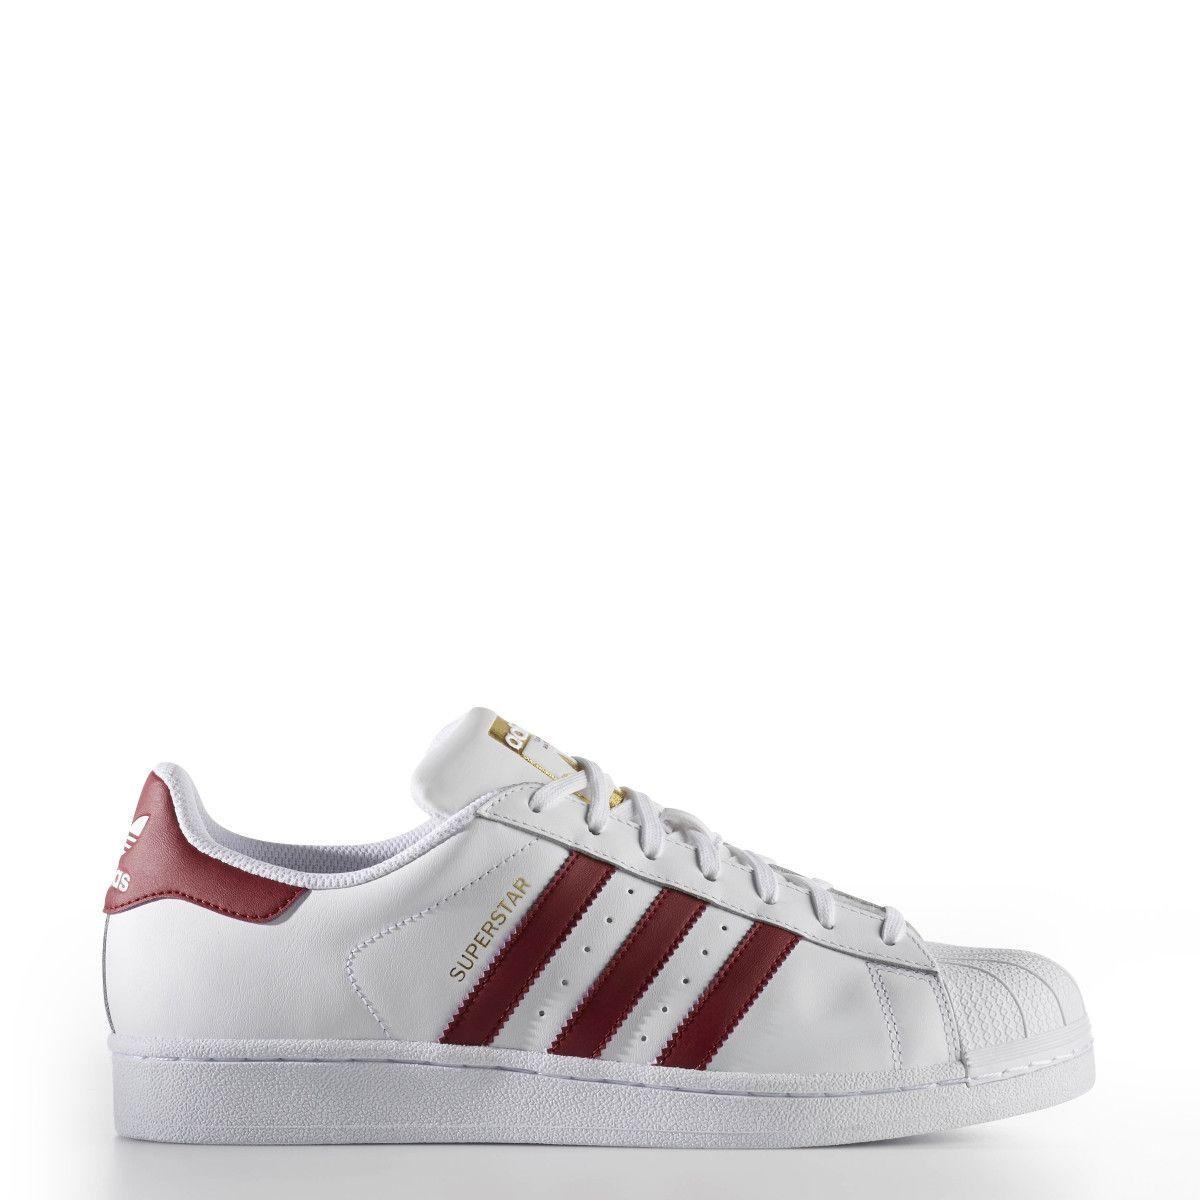 adidas superstar fondazione mens scarpe adidas superstar